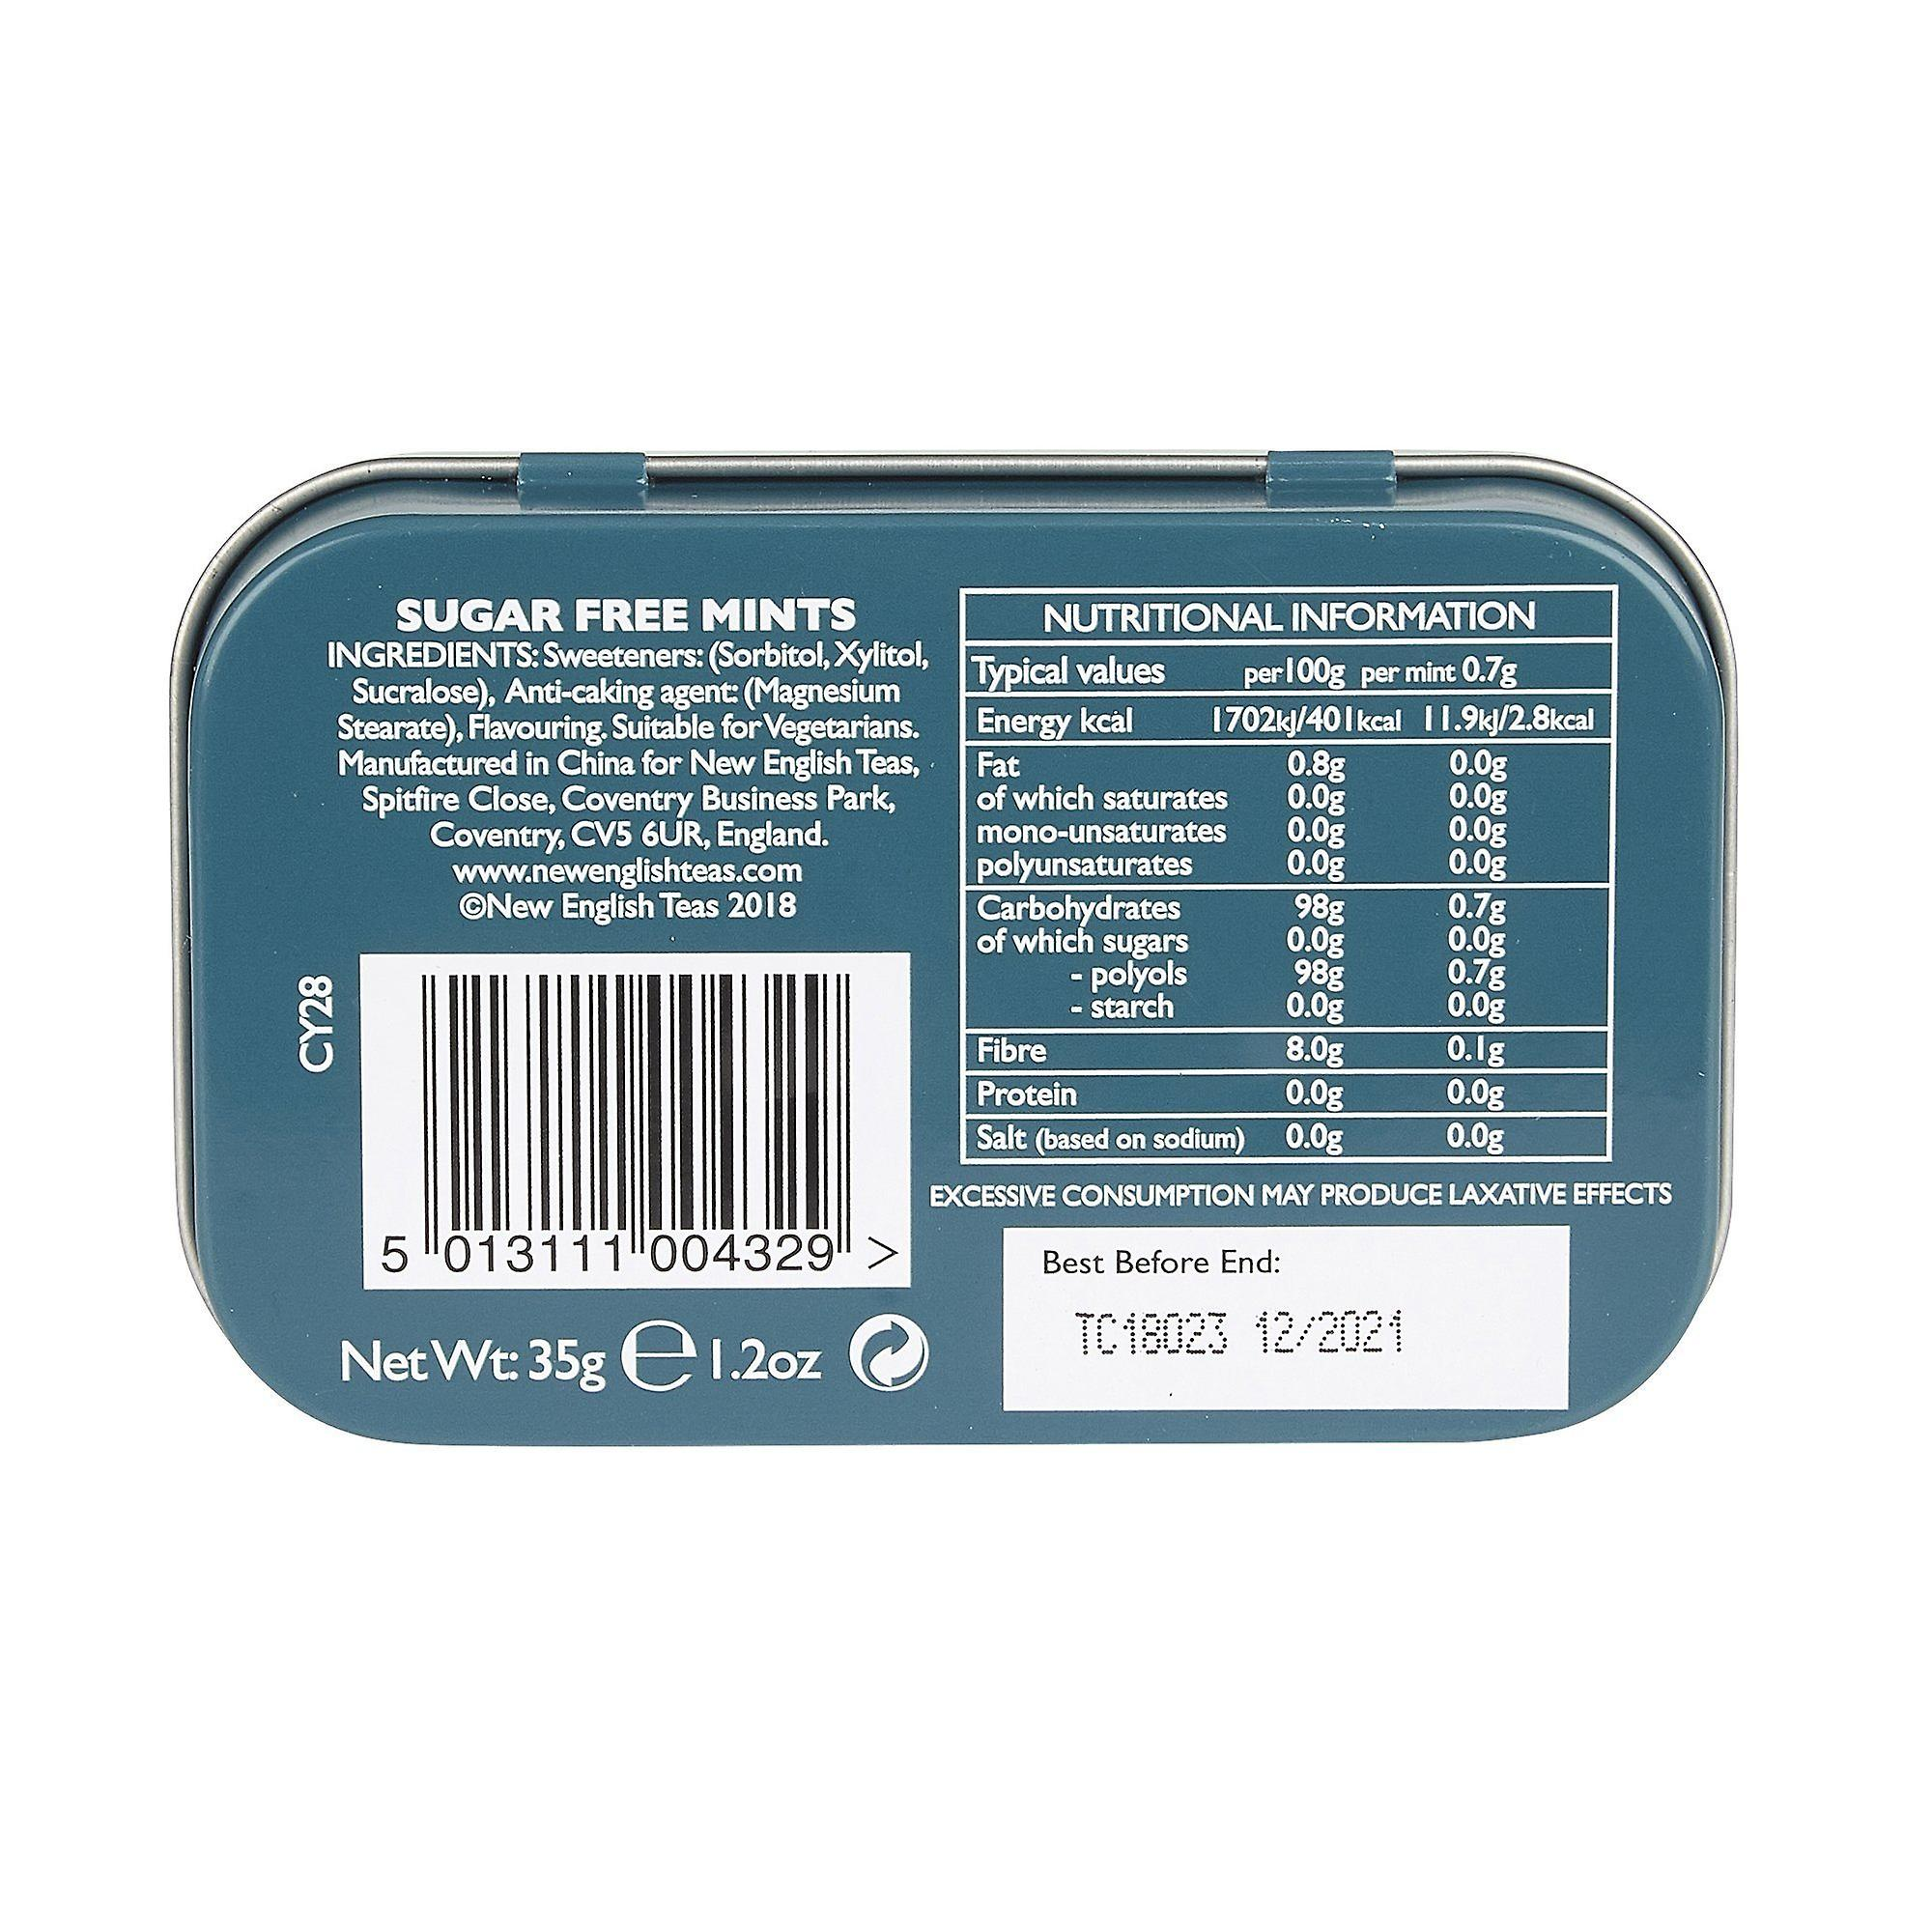 University of cambridge sugar free mints pocket tin 35g